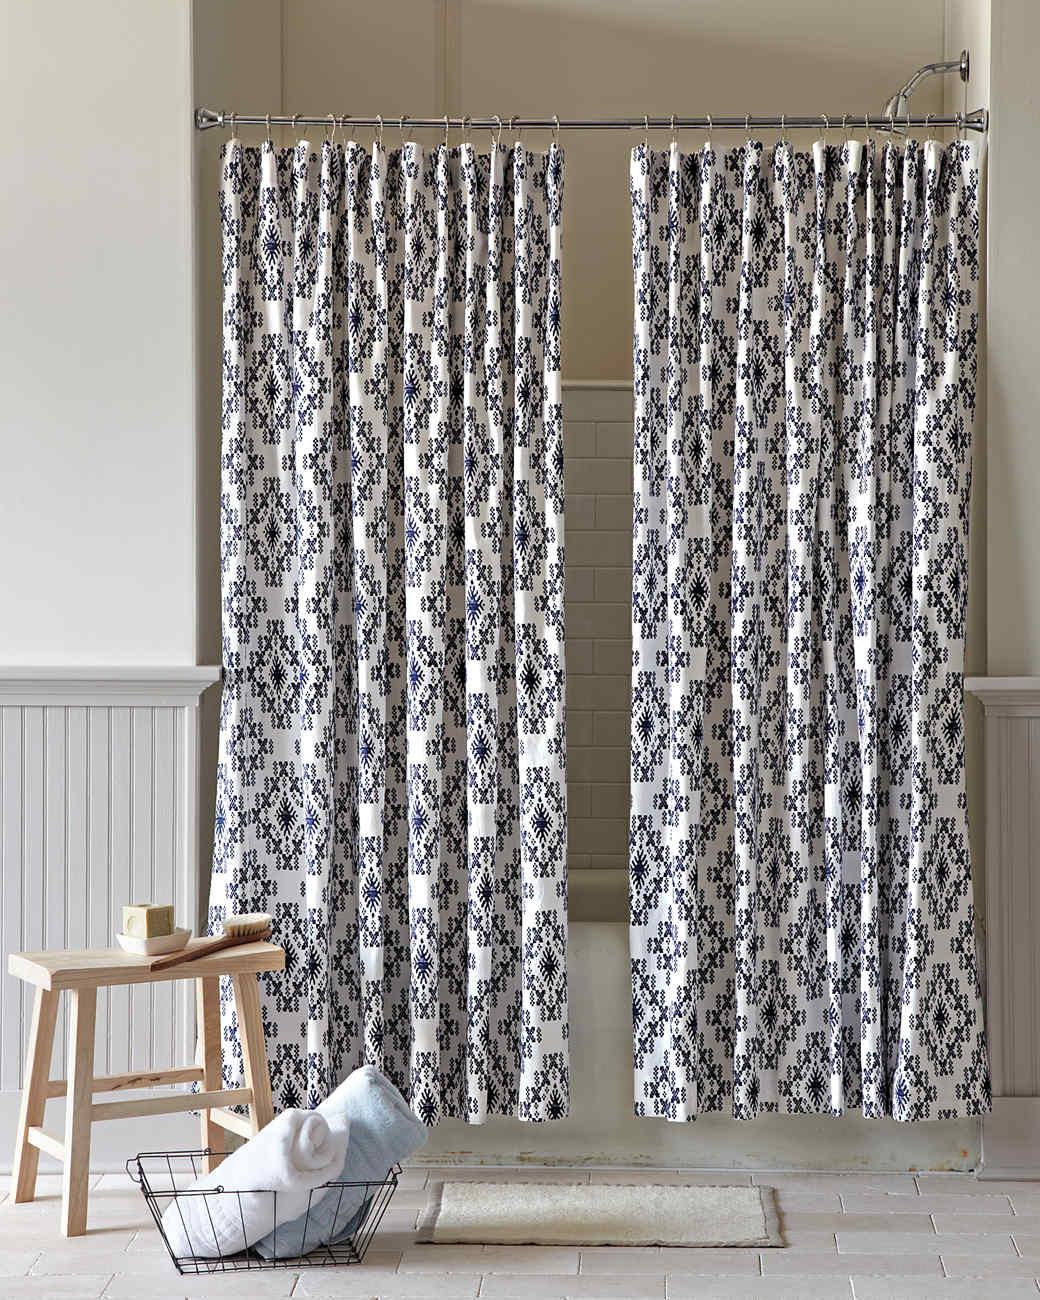 shower-curtain-1011mld107603.jpg